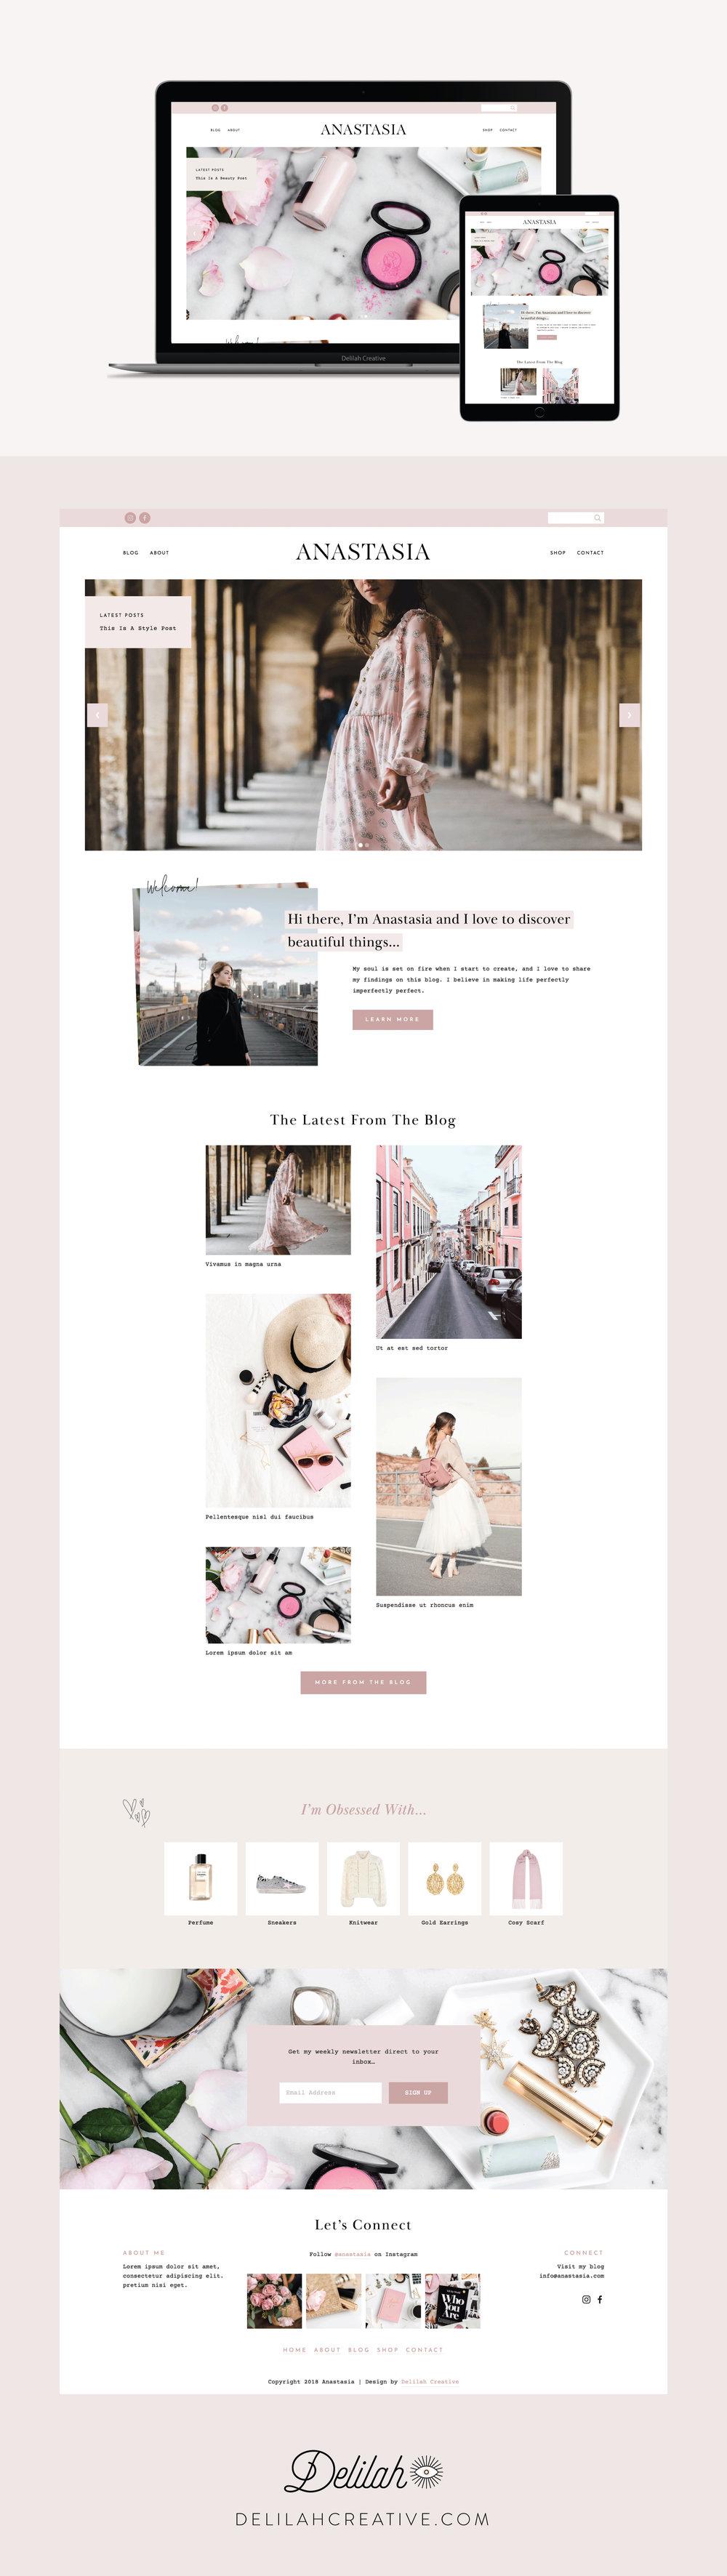 Anastasia - Pinterest-01.jpg